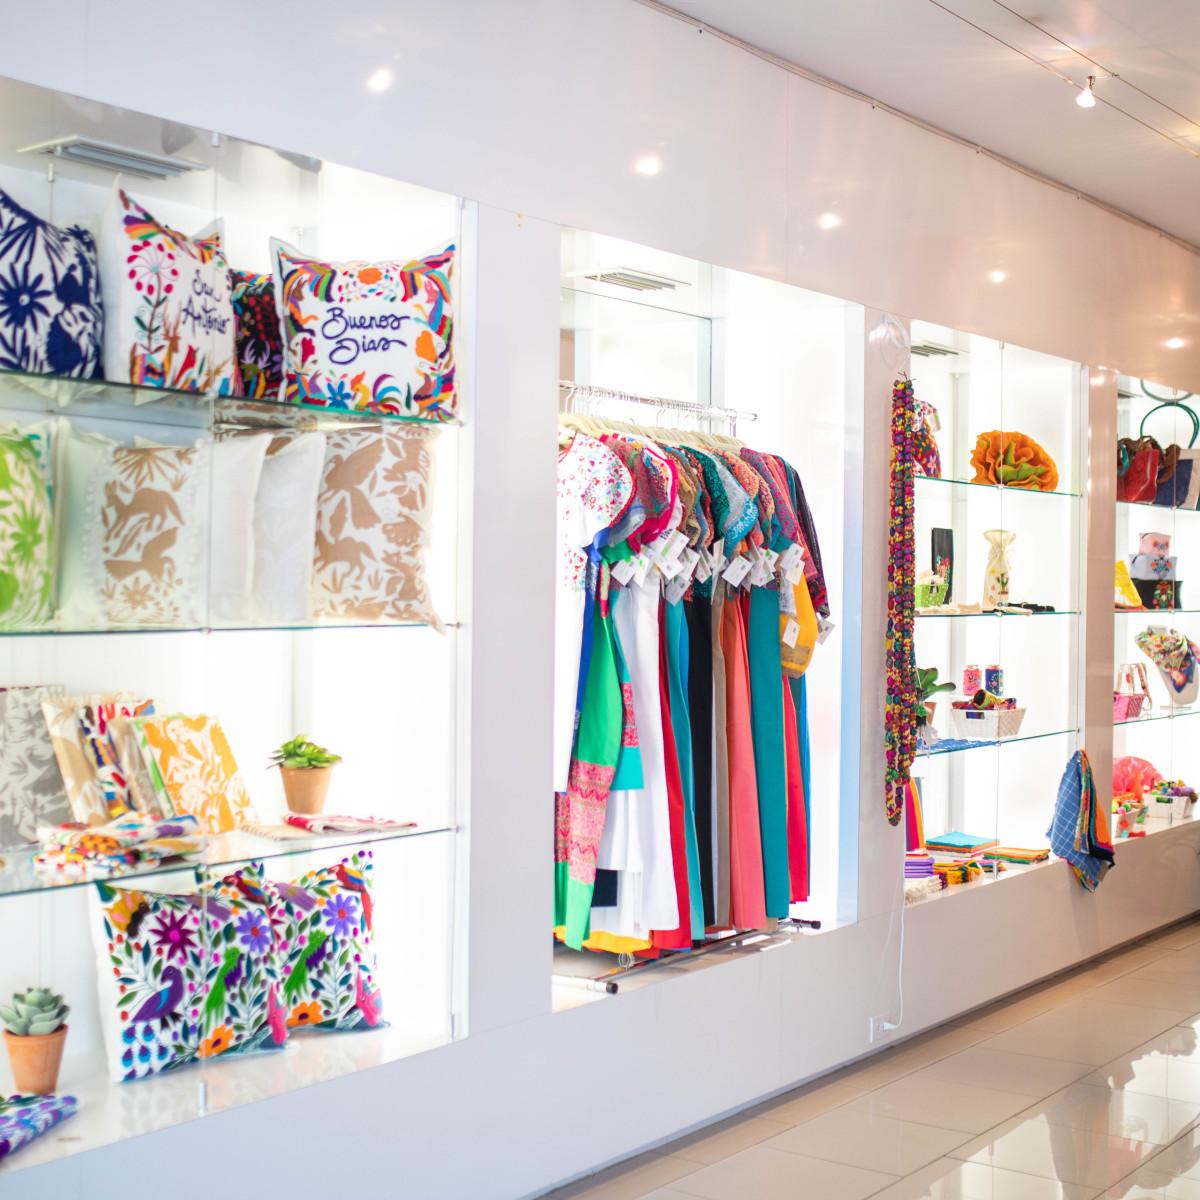 4 San Antonio Shops For Embroidered Dresses And More Fiesta Looks Culturemap San Antonio